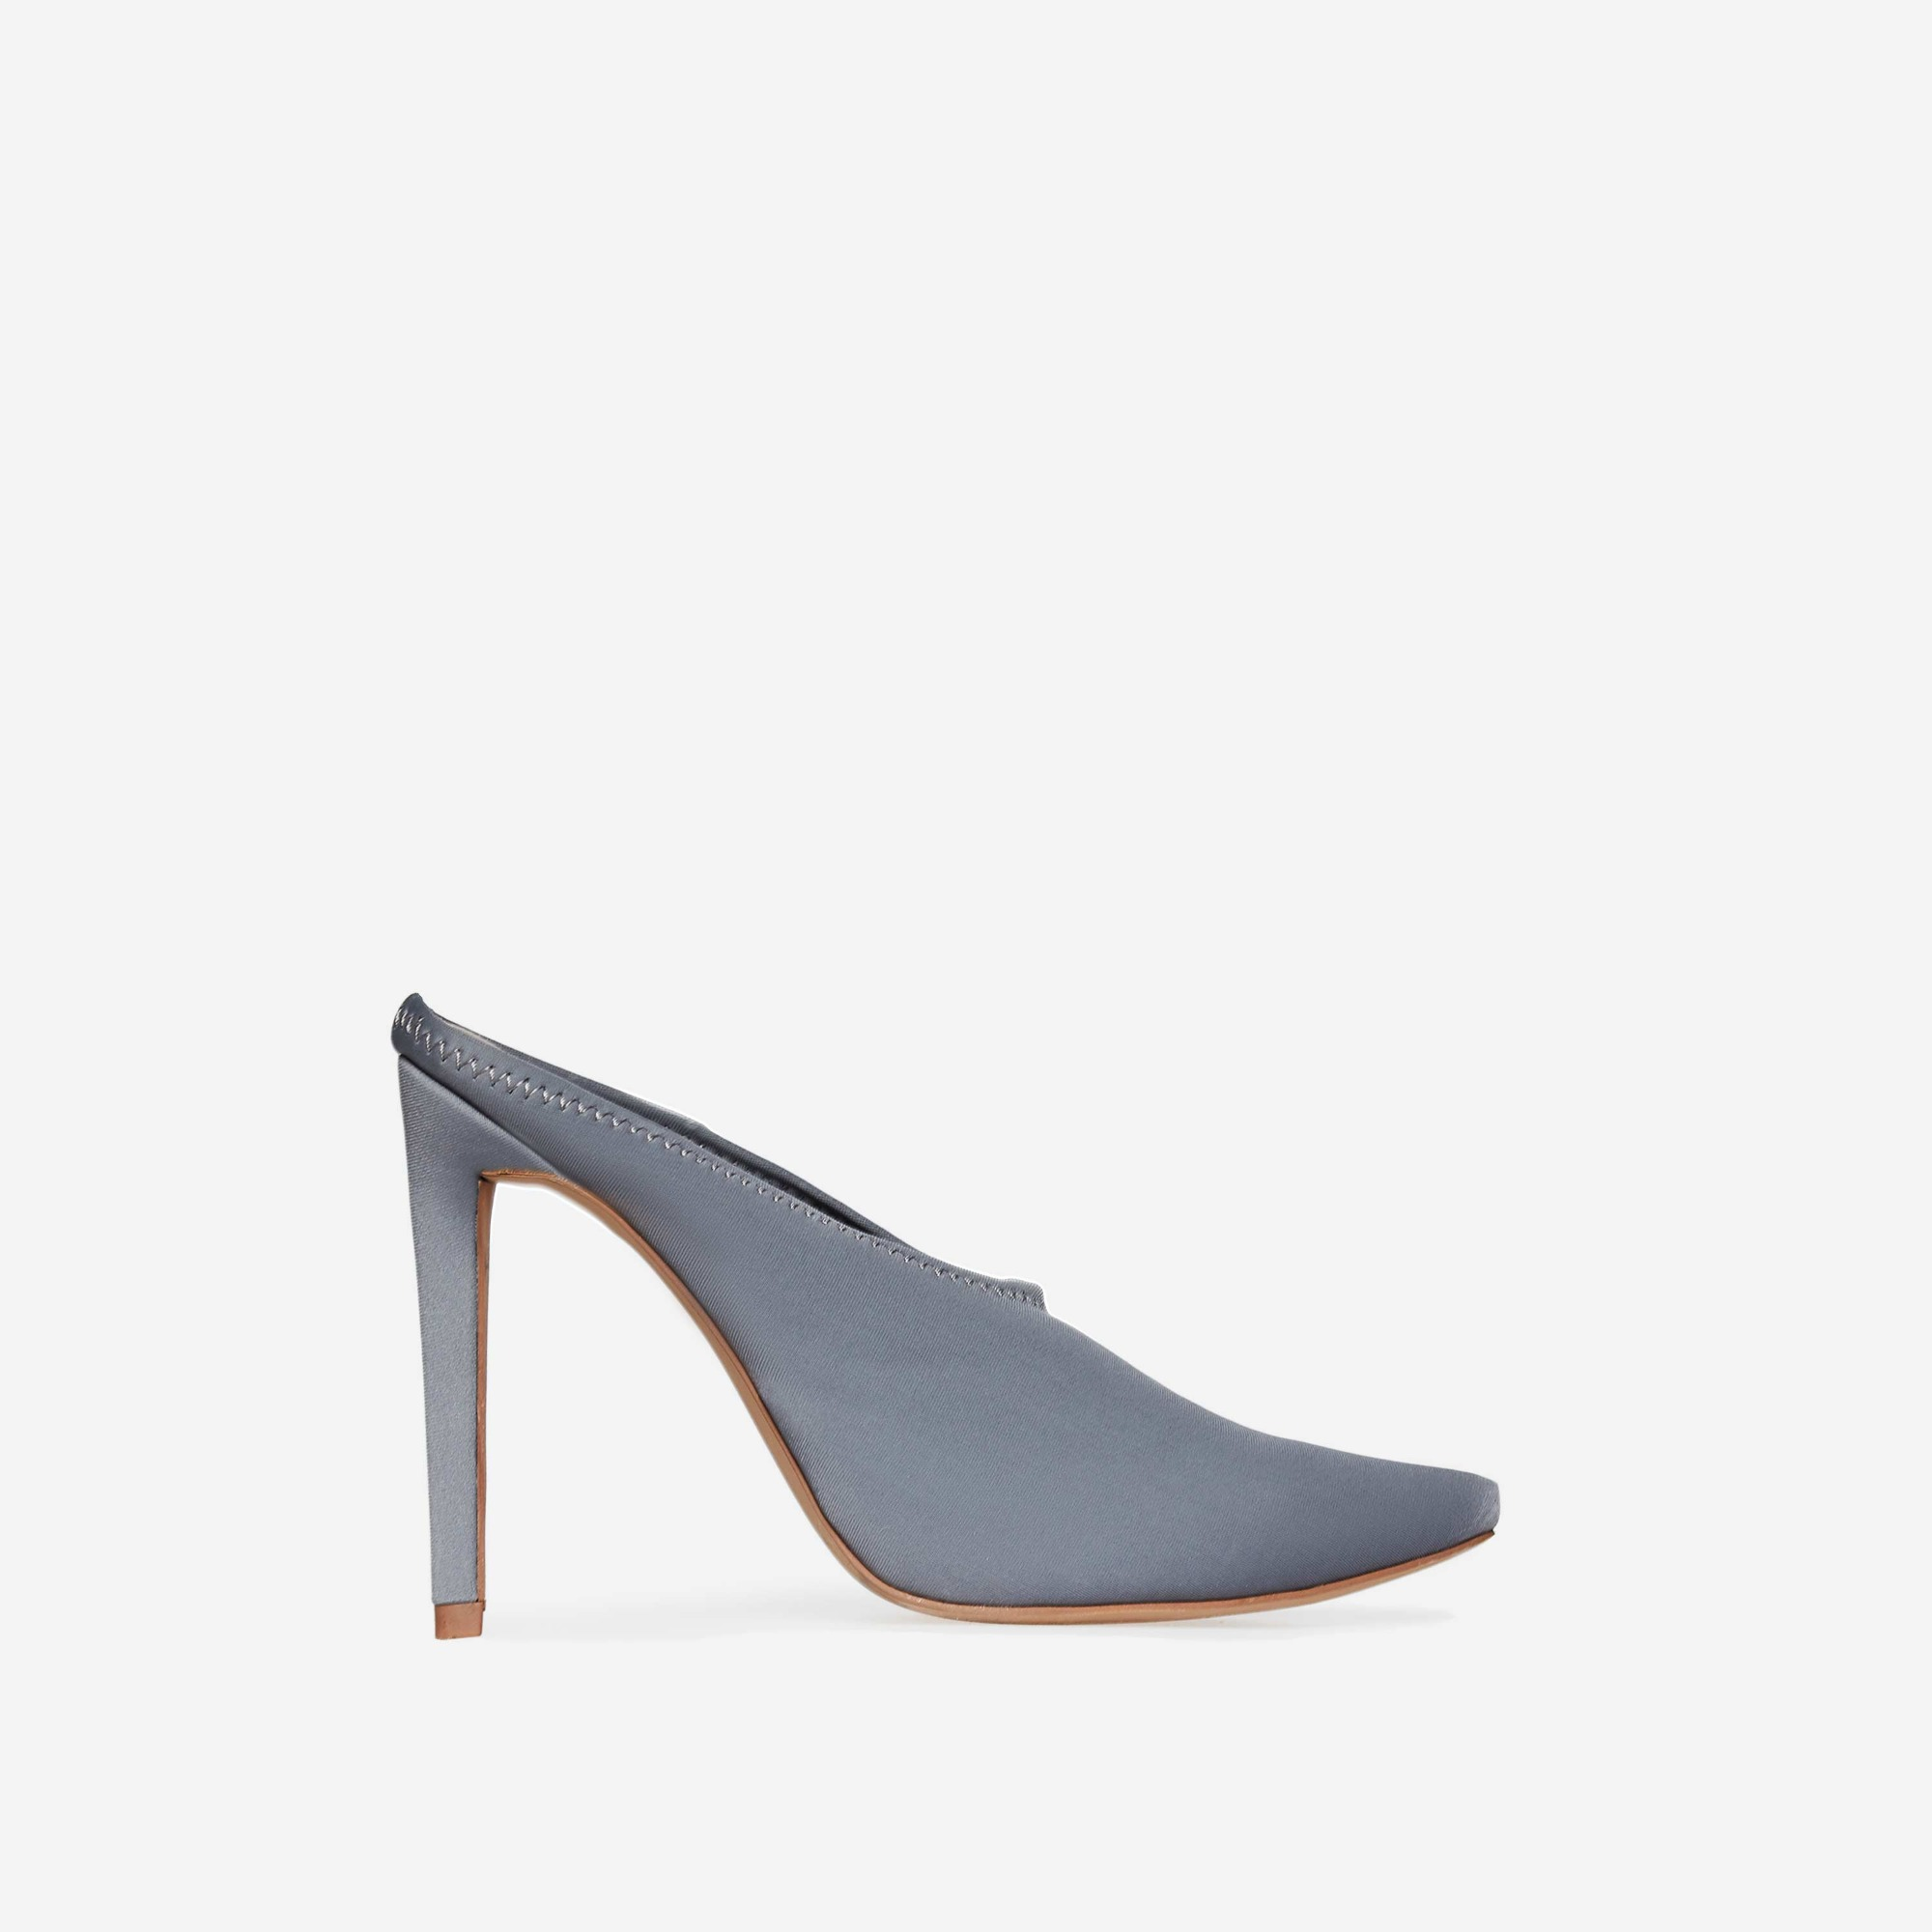 Darla Closed Toe Mule Heel In Grey Lycra